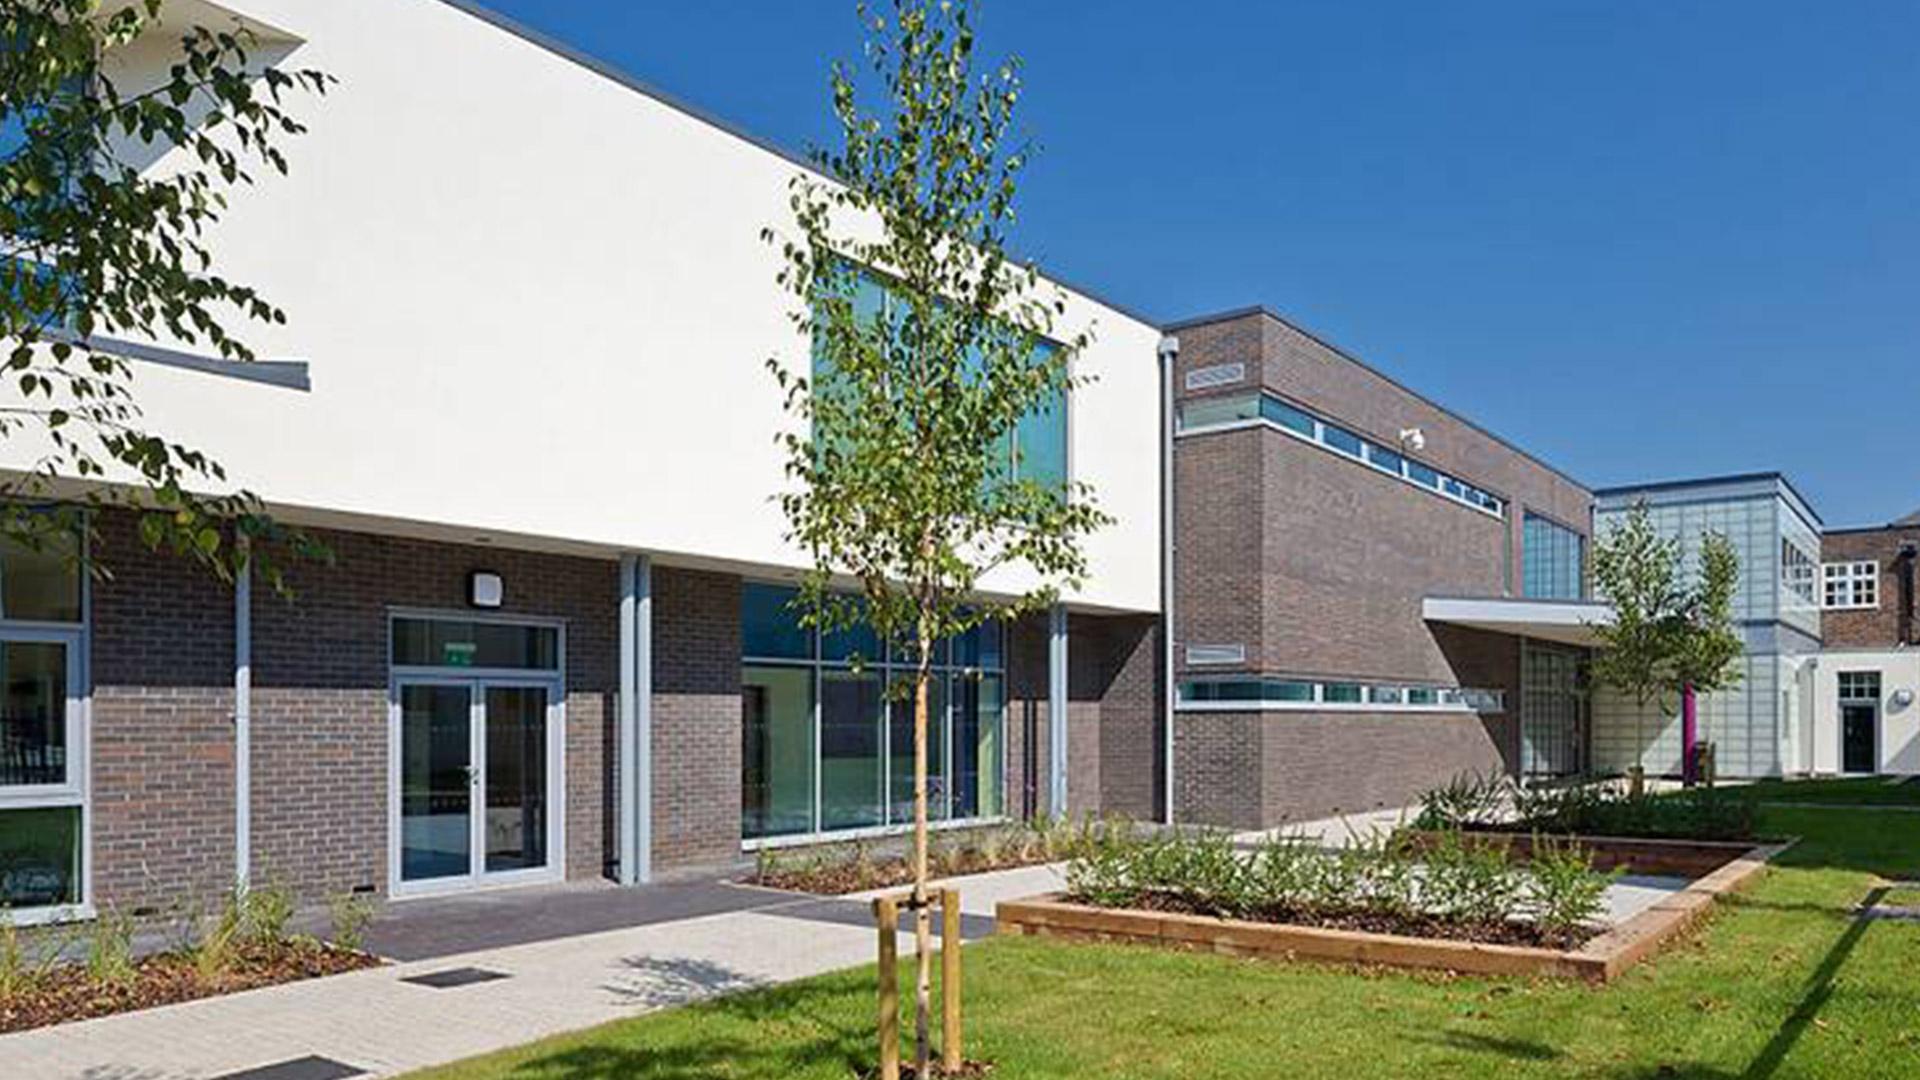 Purbrook Park School